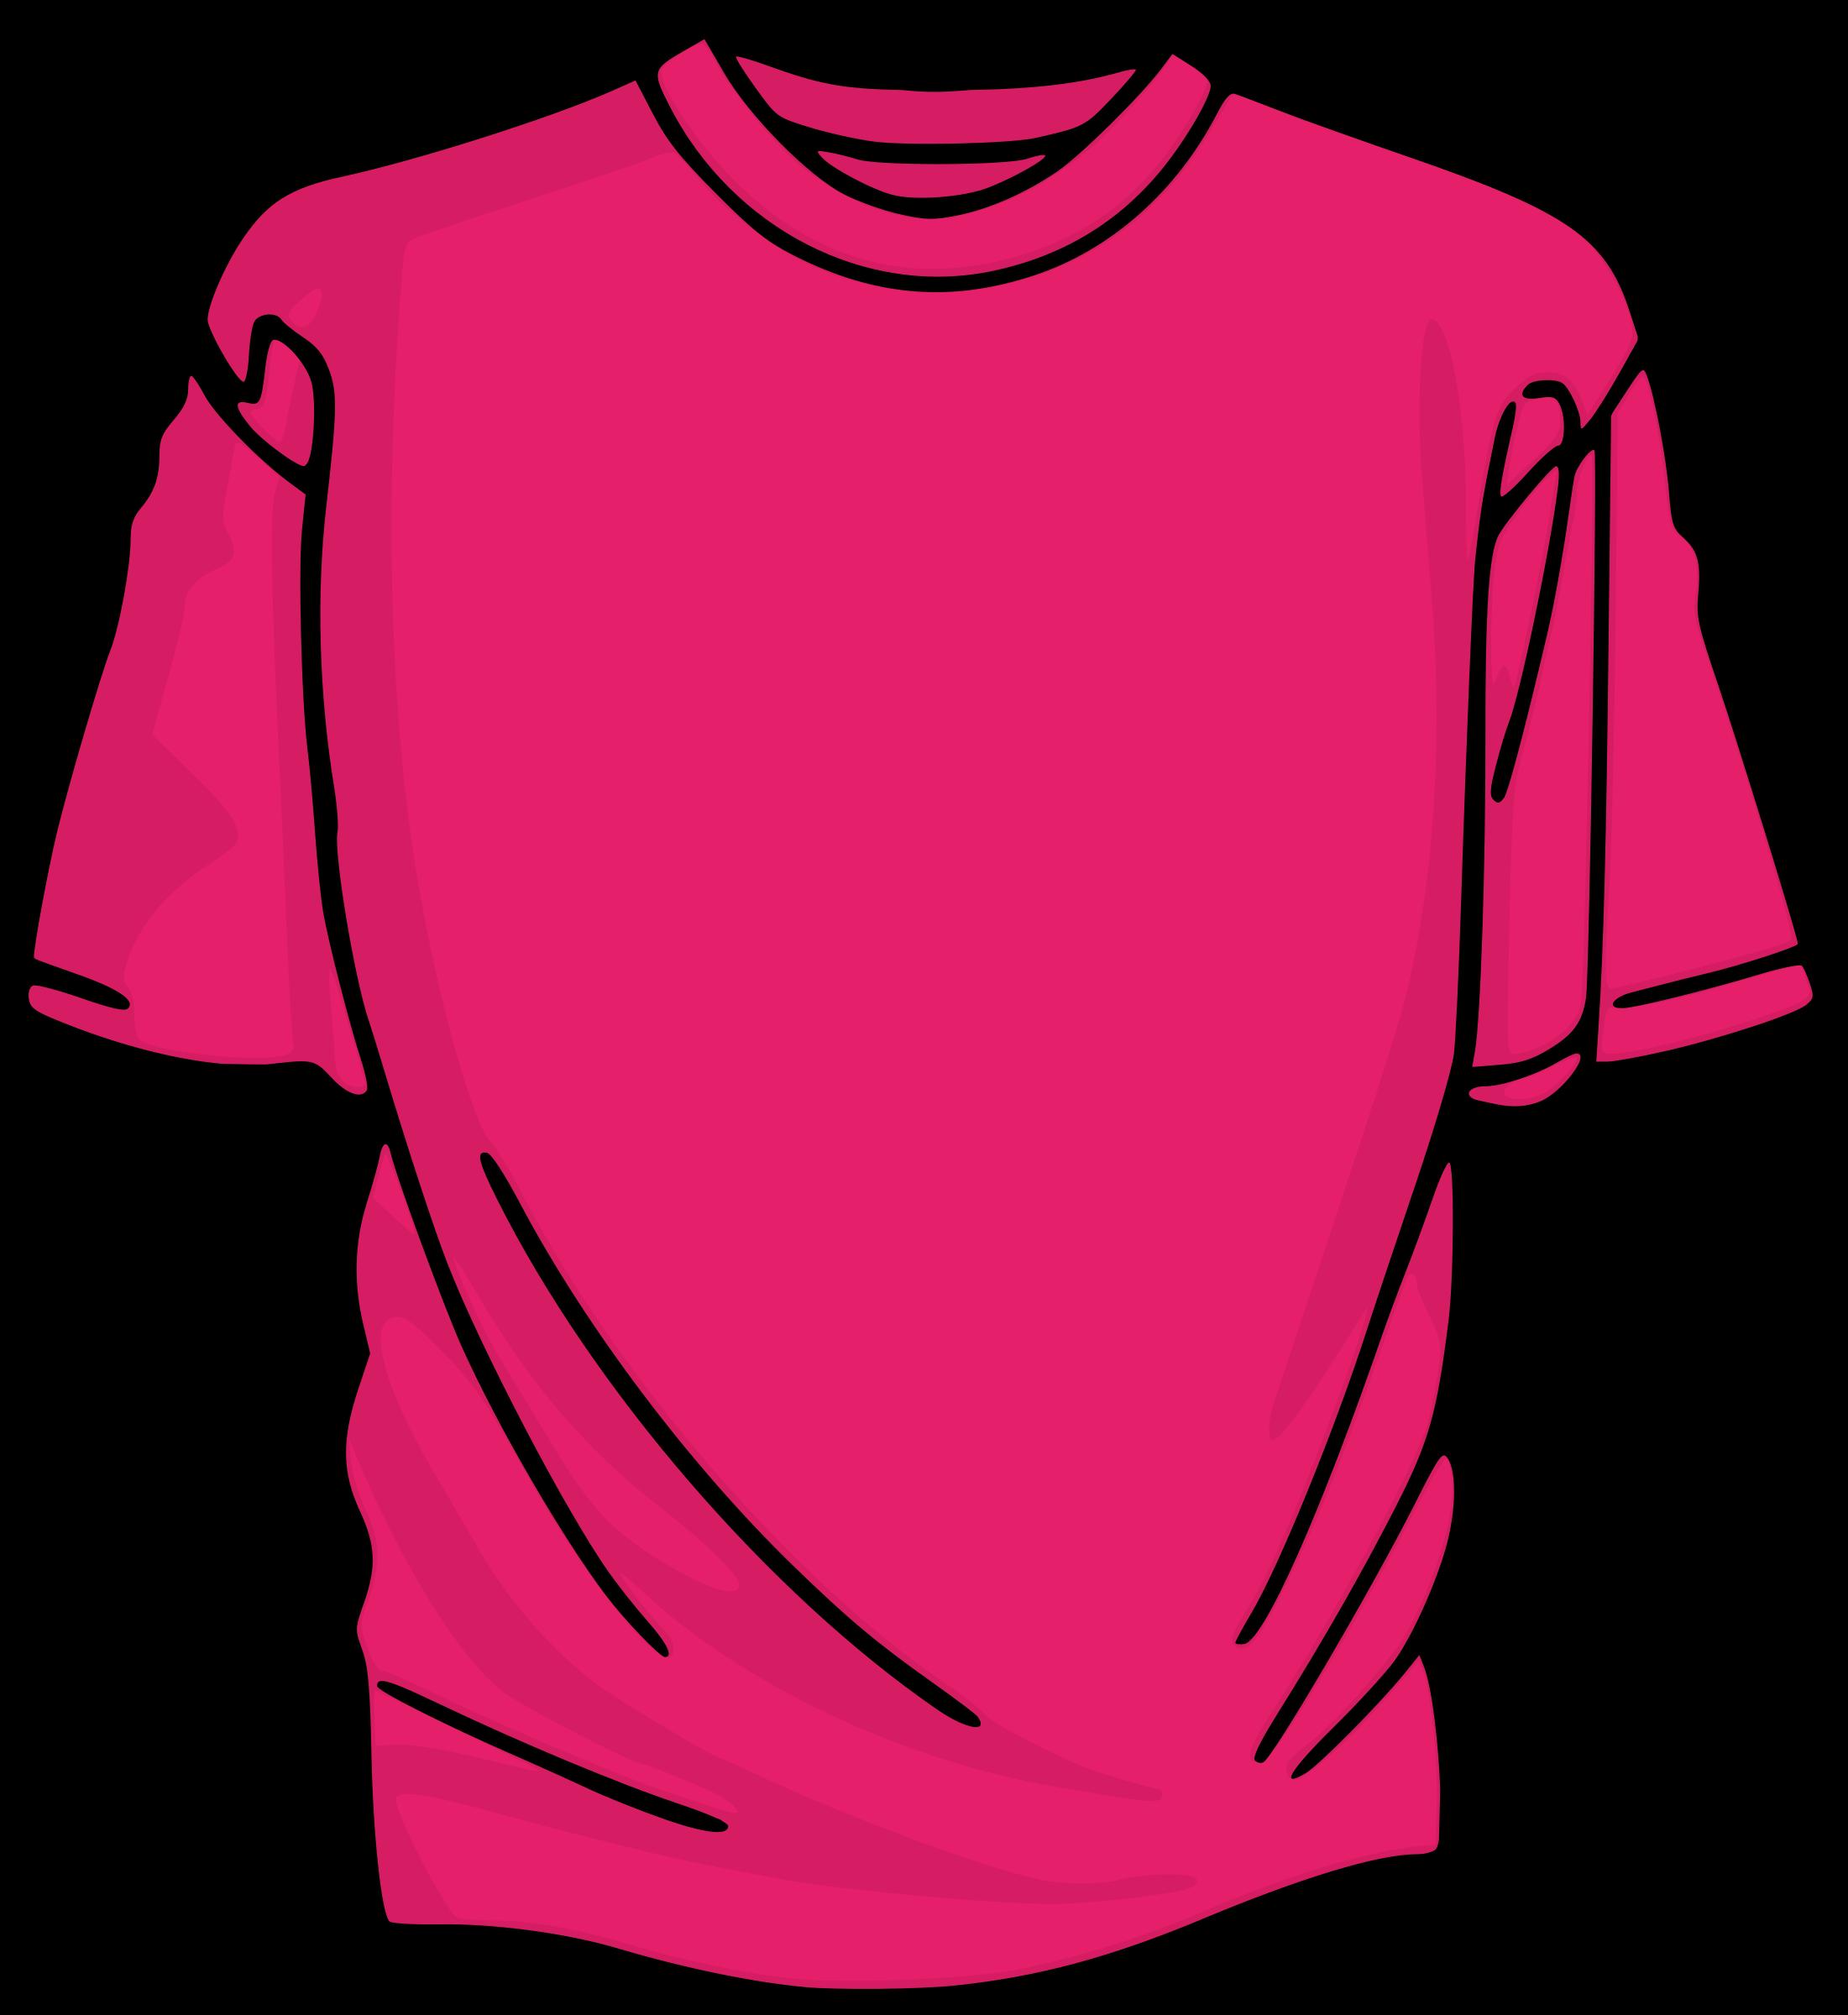 2201x2400 Shirt Clip Art Free Clipart Images 2